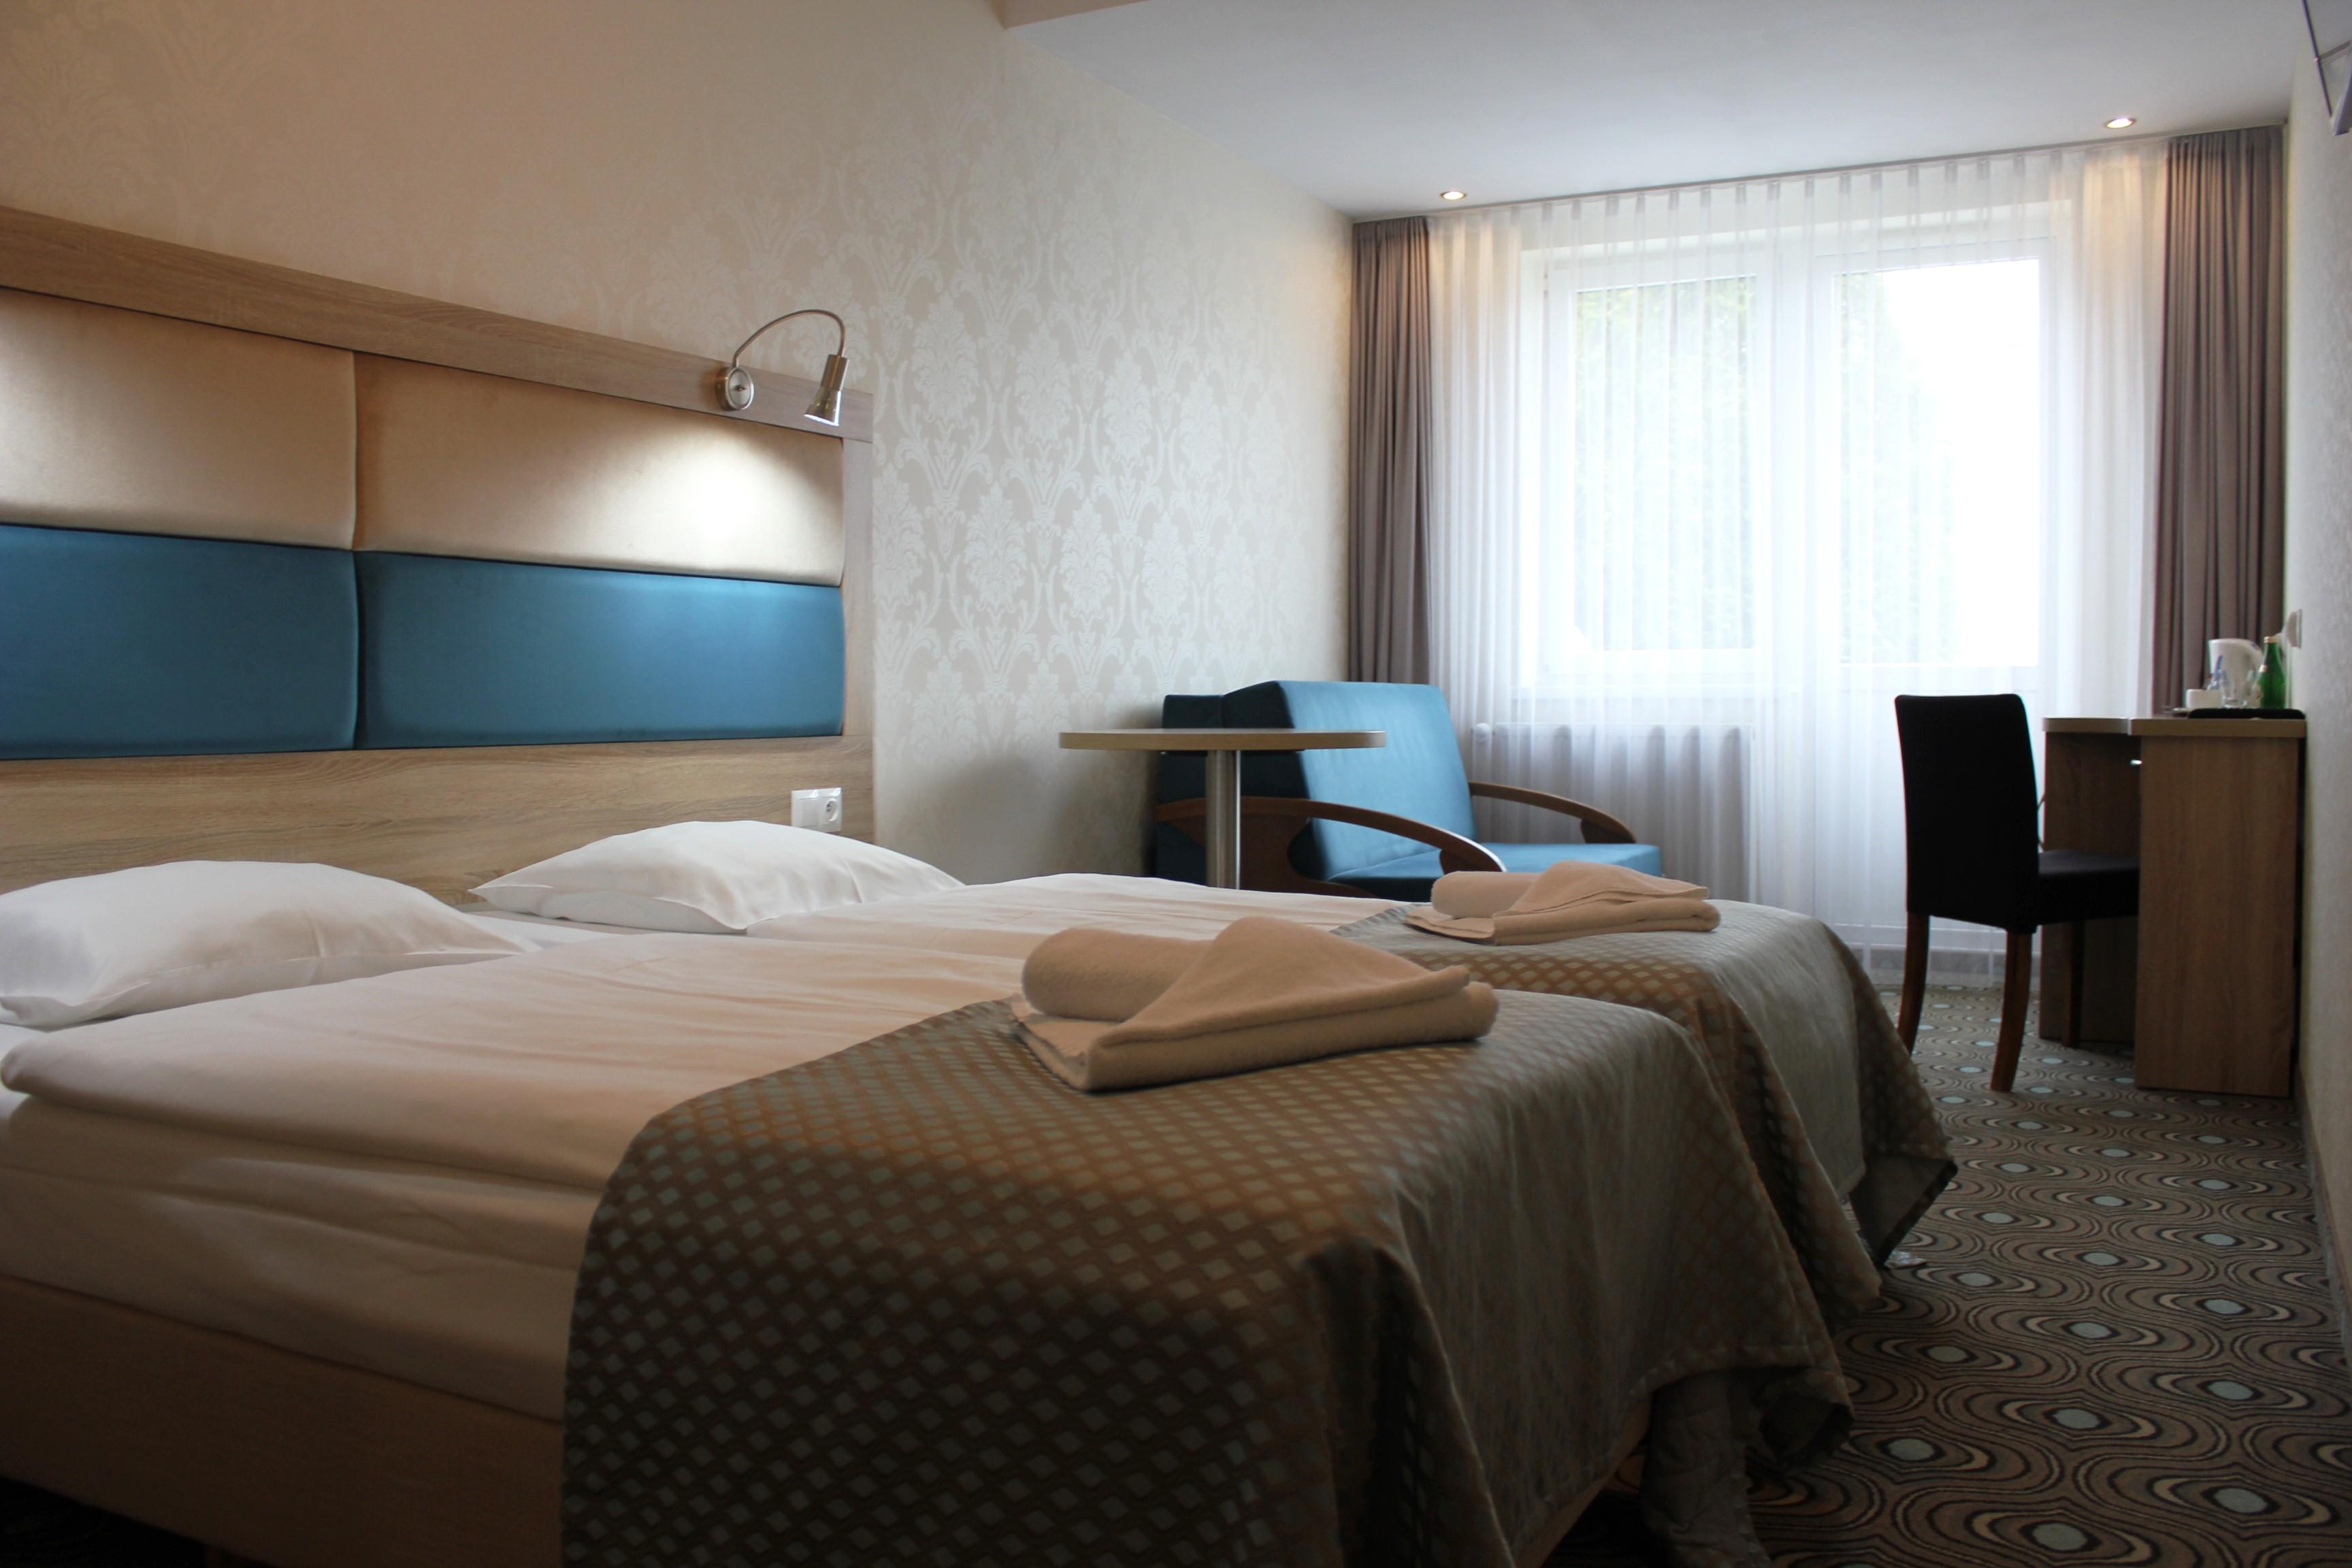 Pokój Rodzinny - Imperiall Resort & MediSpa